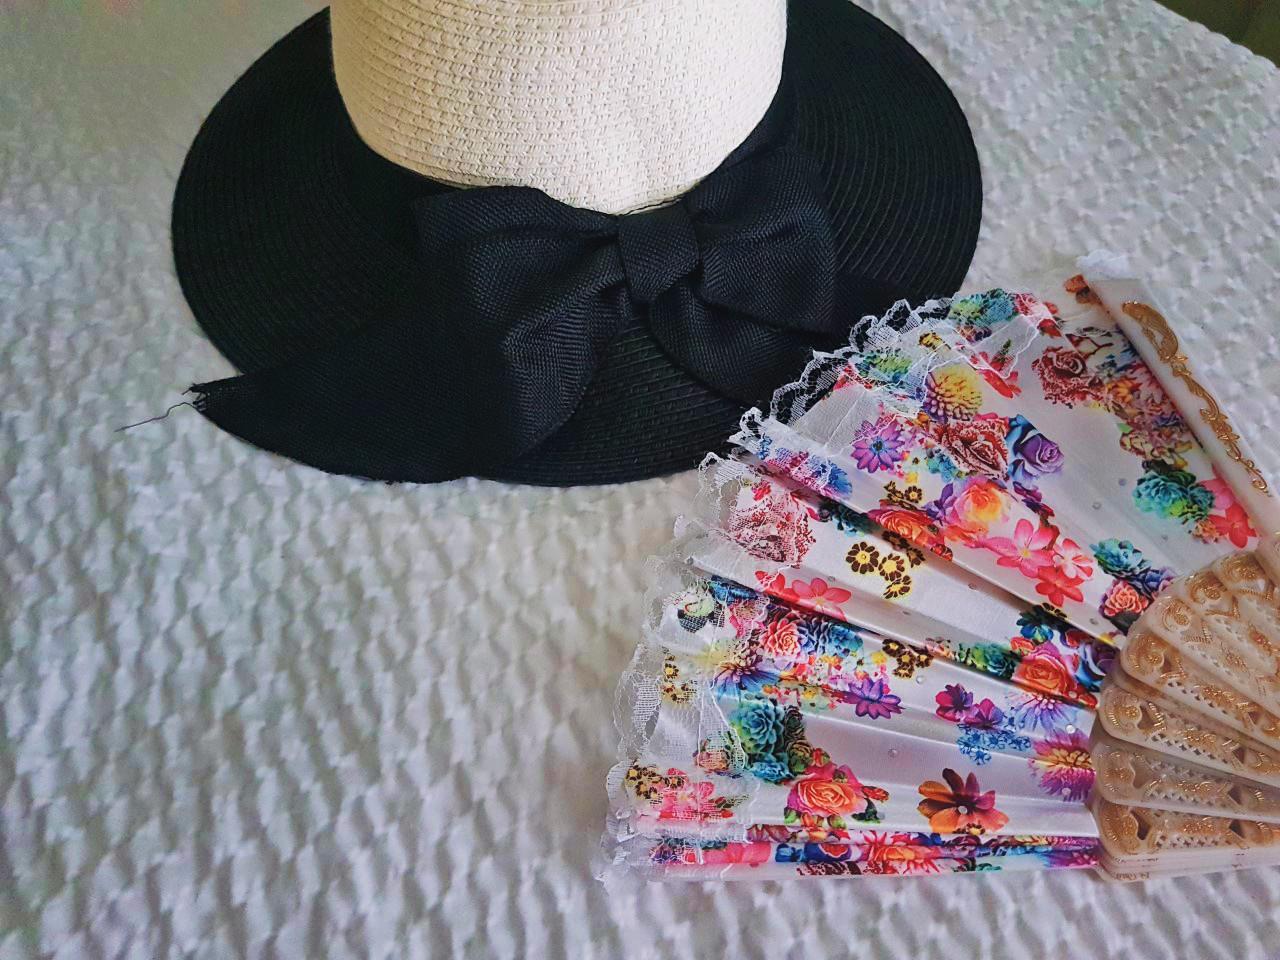 fashion, accessories, New Orleans, sun hat, fan, blogger, tourist, travel